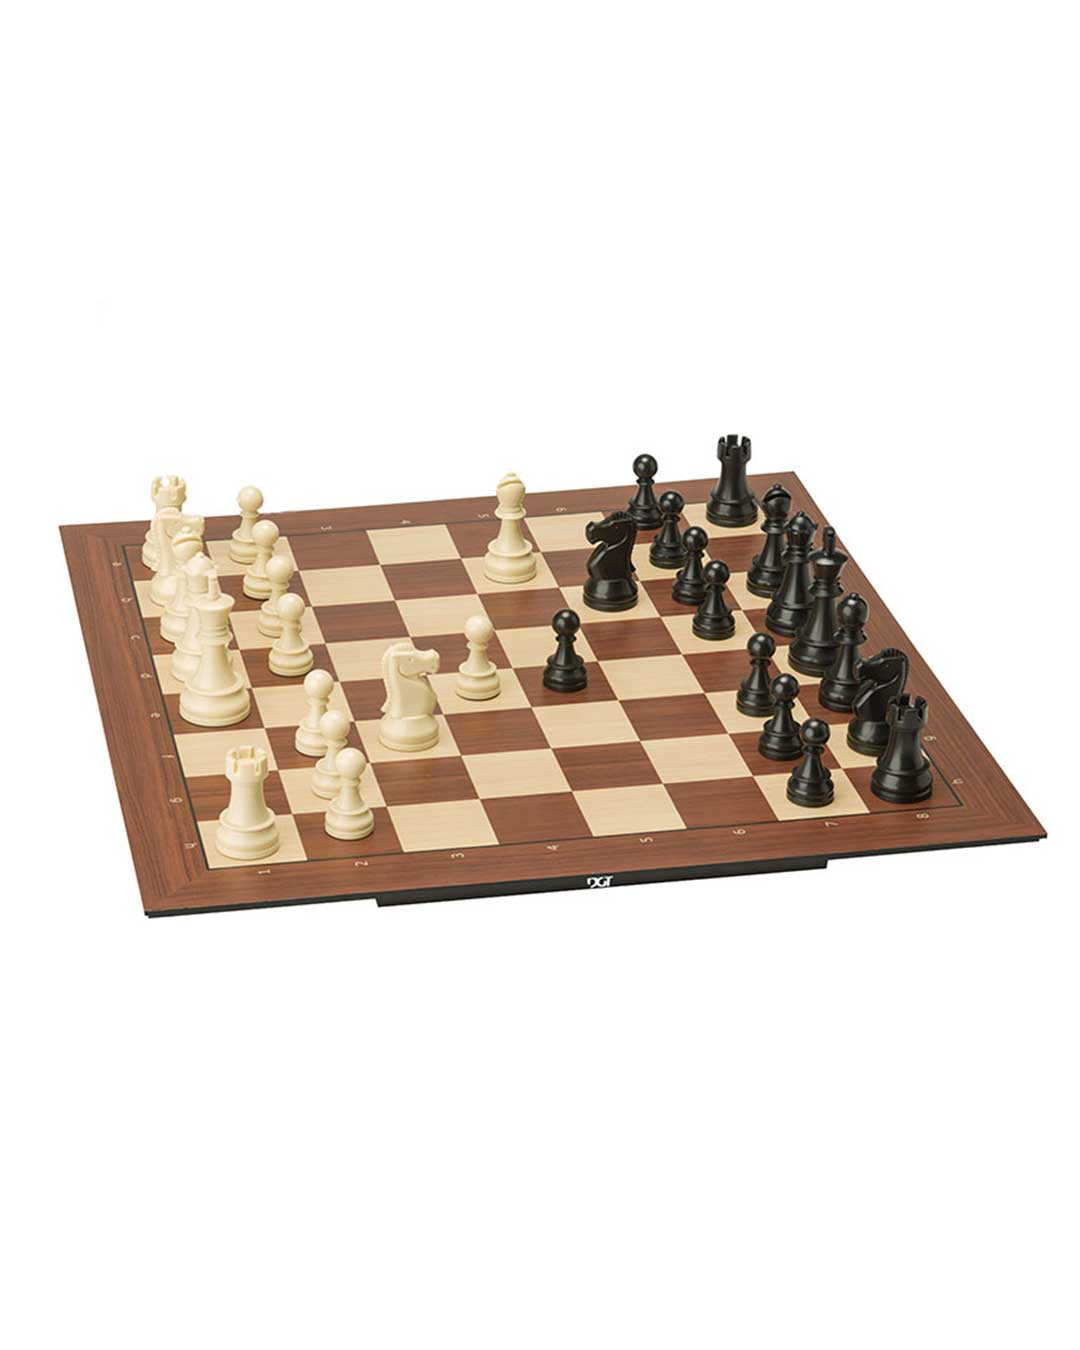 Tablero de ajedrez DGT Smart Board